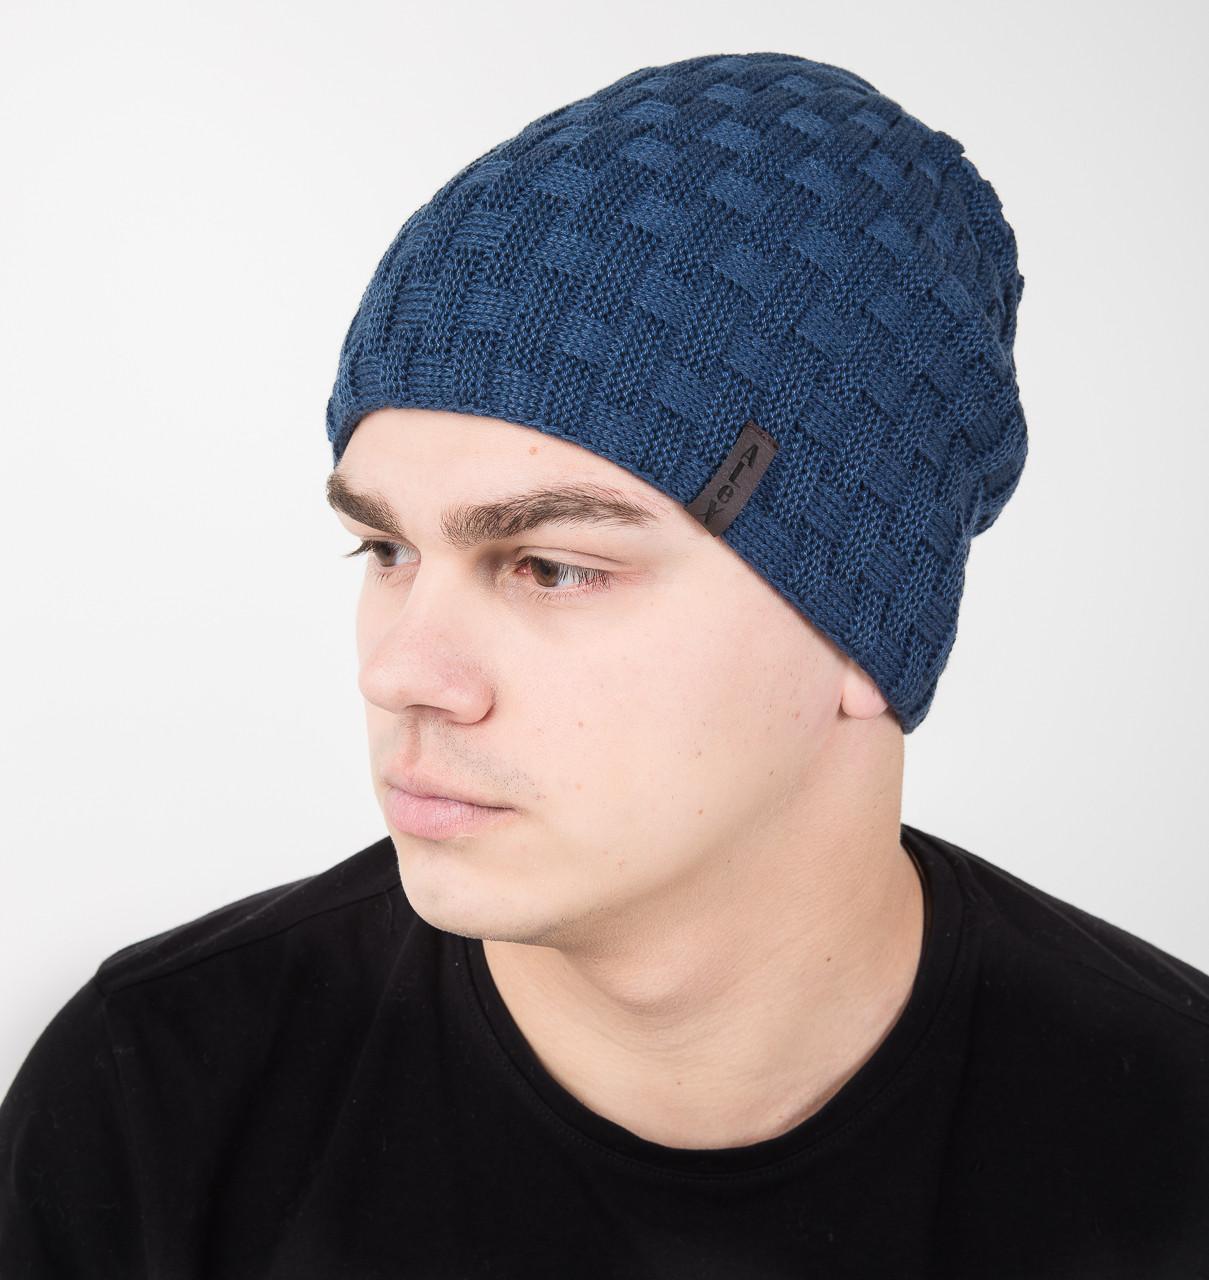 Новинка сезона 2018 мужская шапка на флисе на 2 стороны - Артикул AL17027